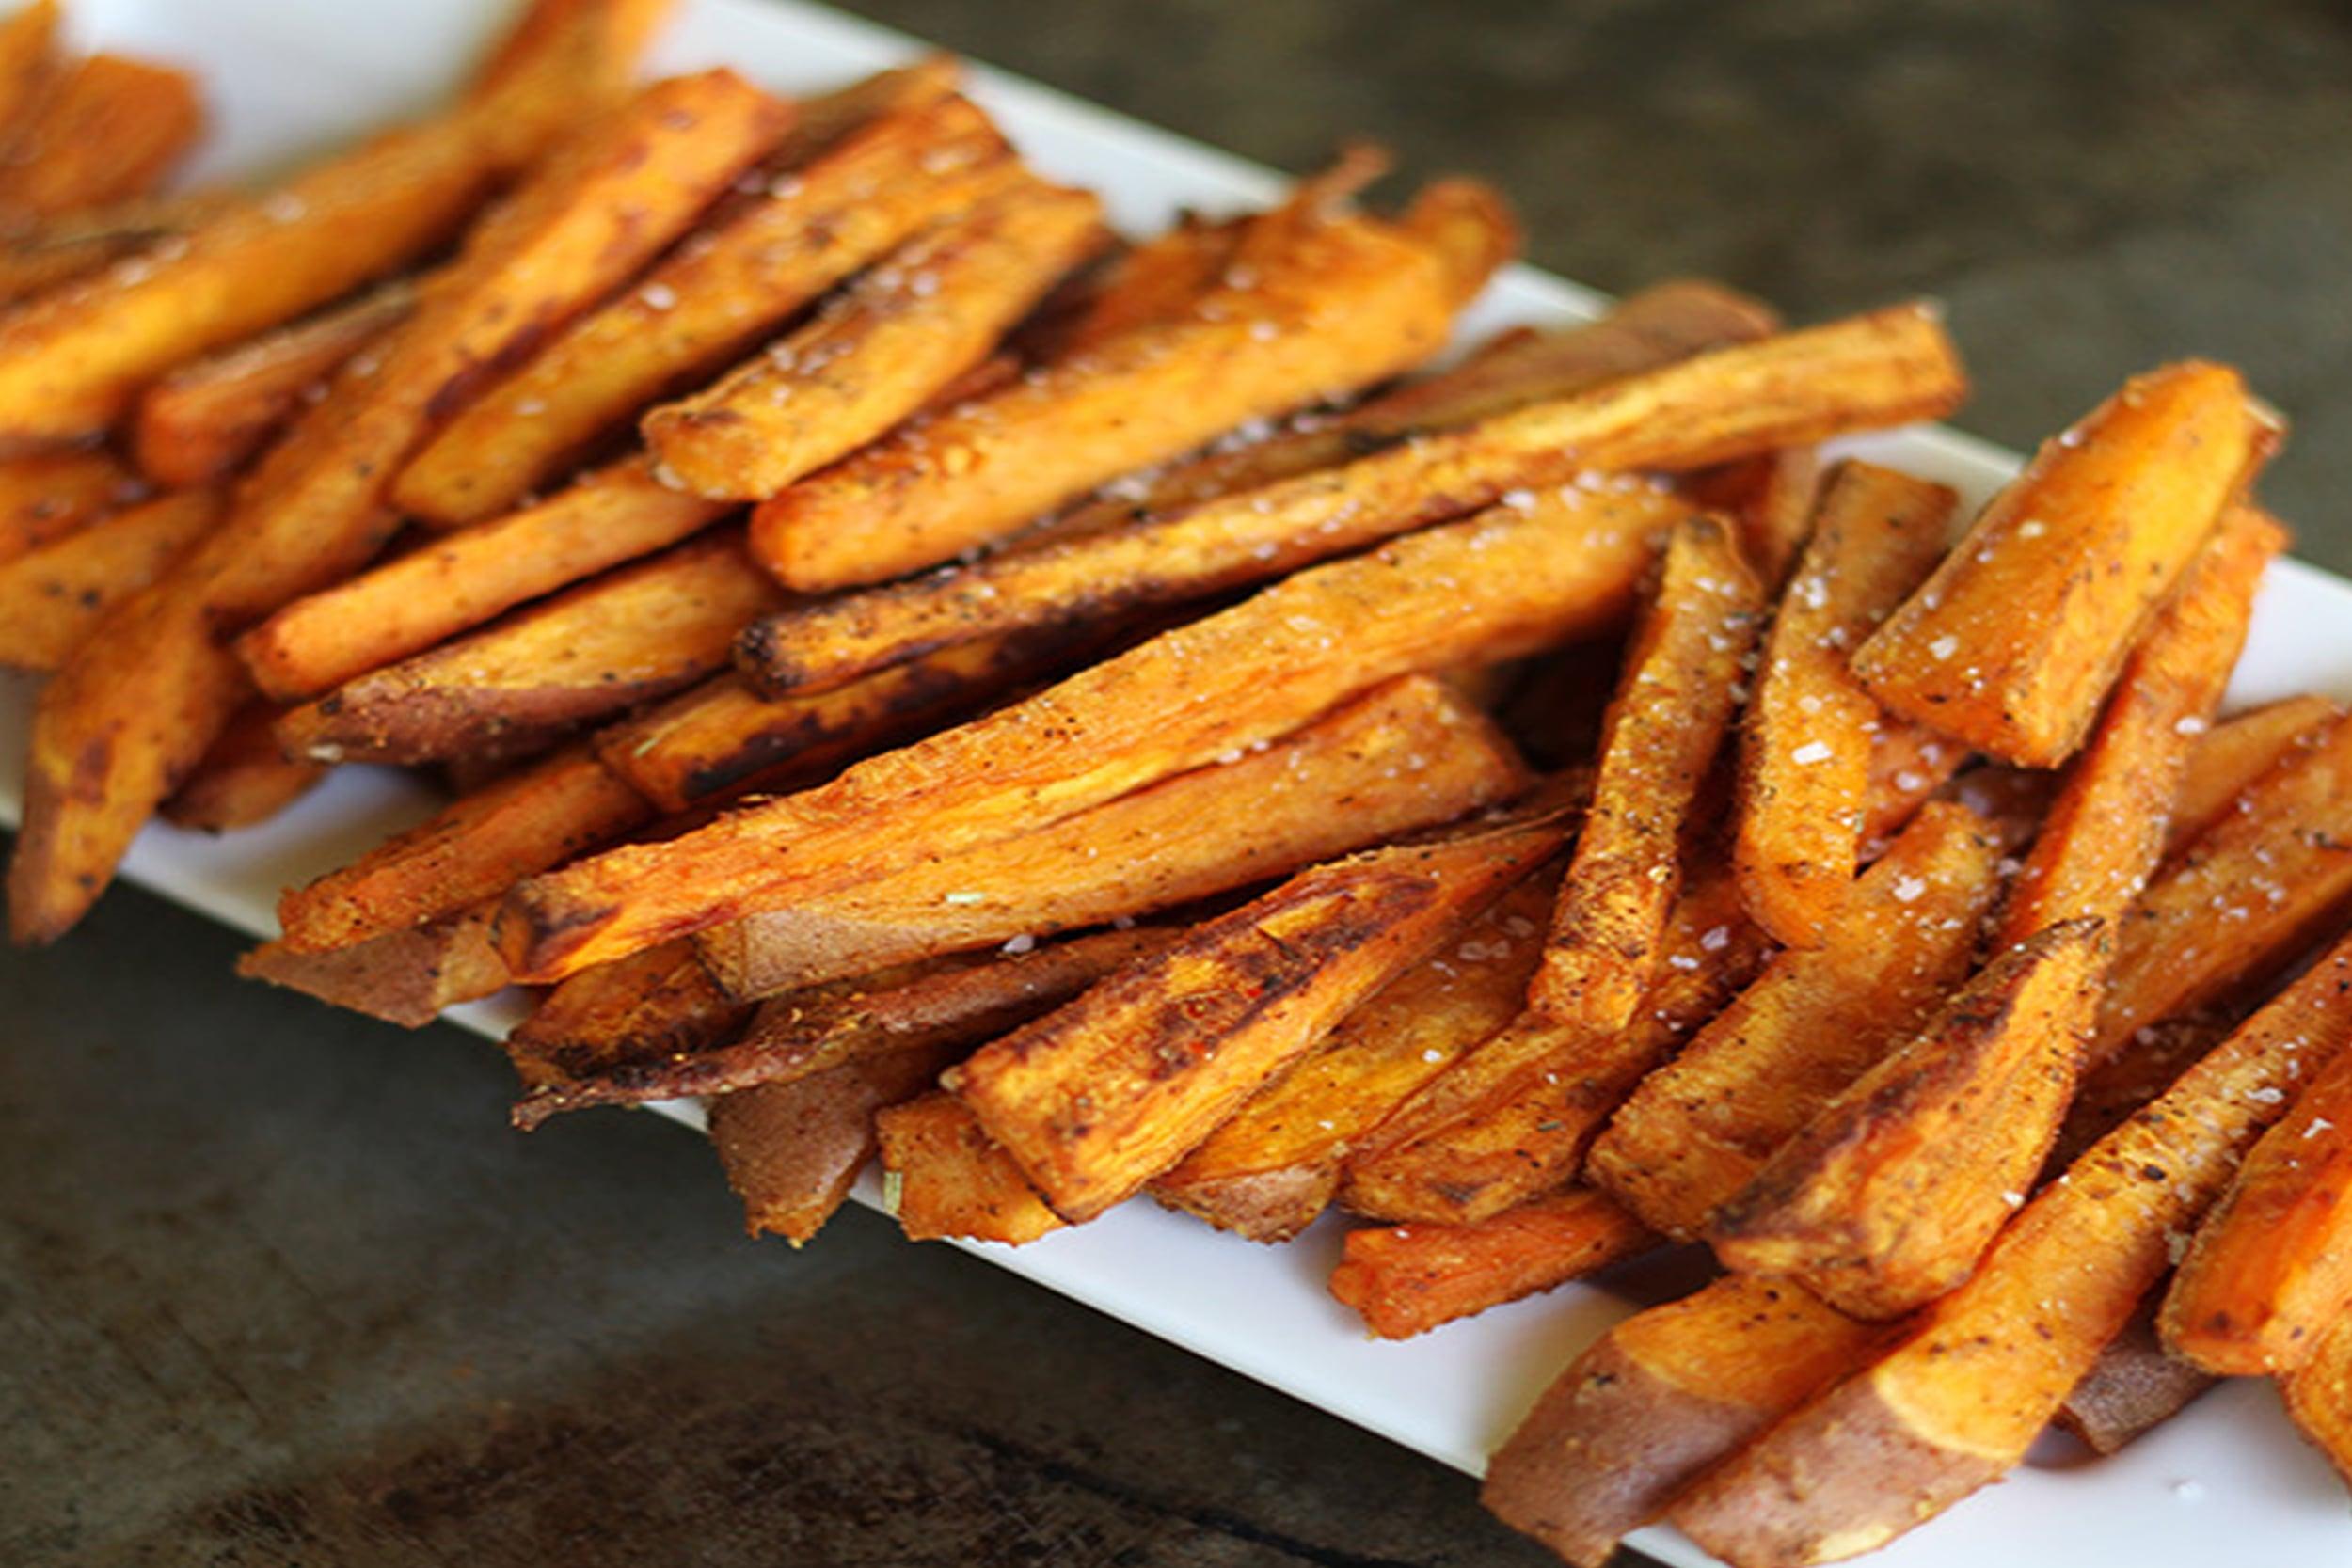 Oven Roasted Sweet Potato Fries4.jpg